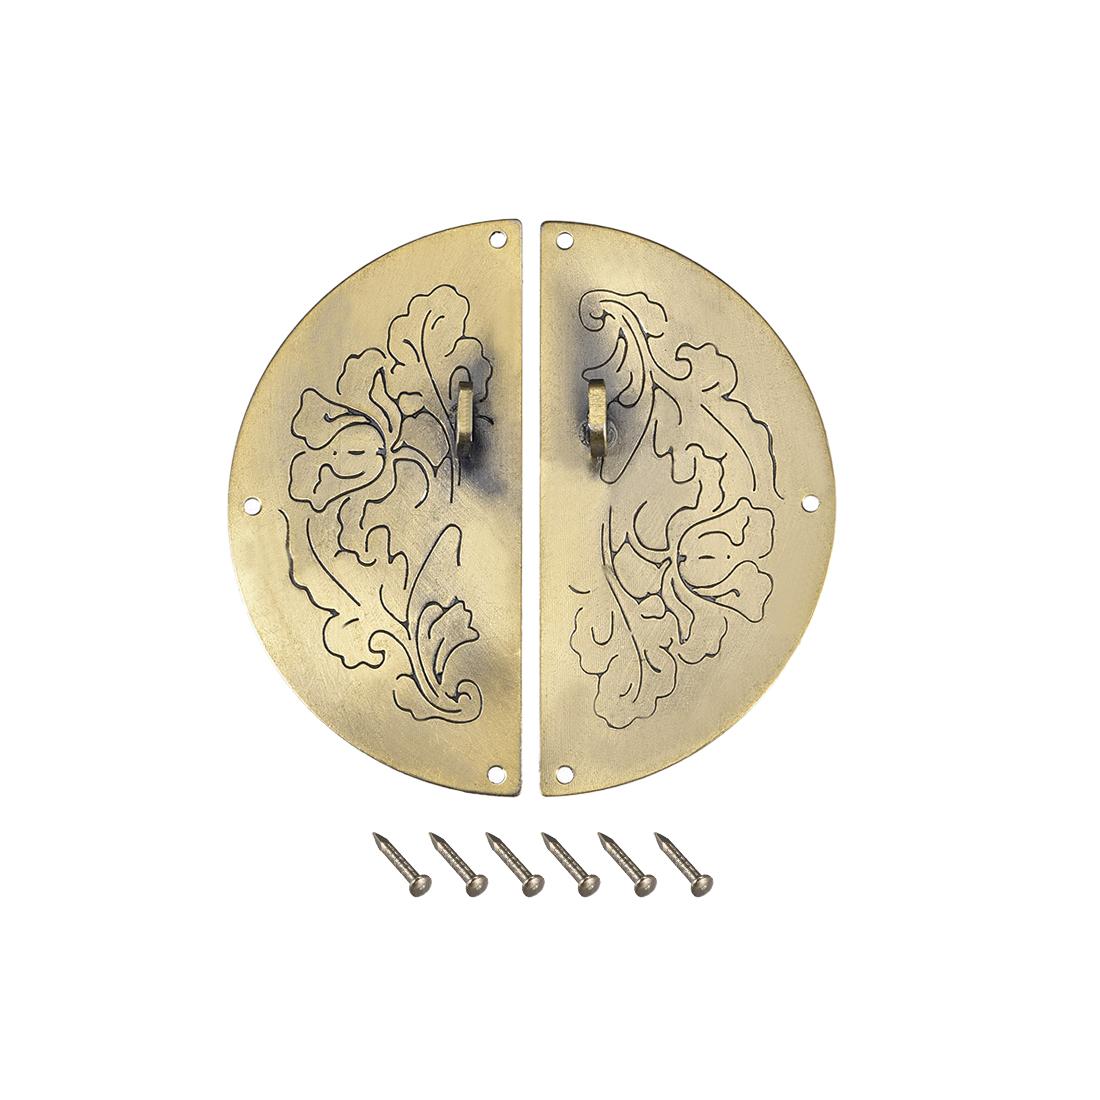 Wood Case Box Round Hasp 75x11mm Closure Antique Latches Bronze Tone, 3 Pcs